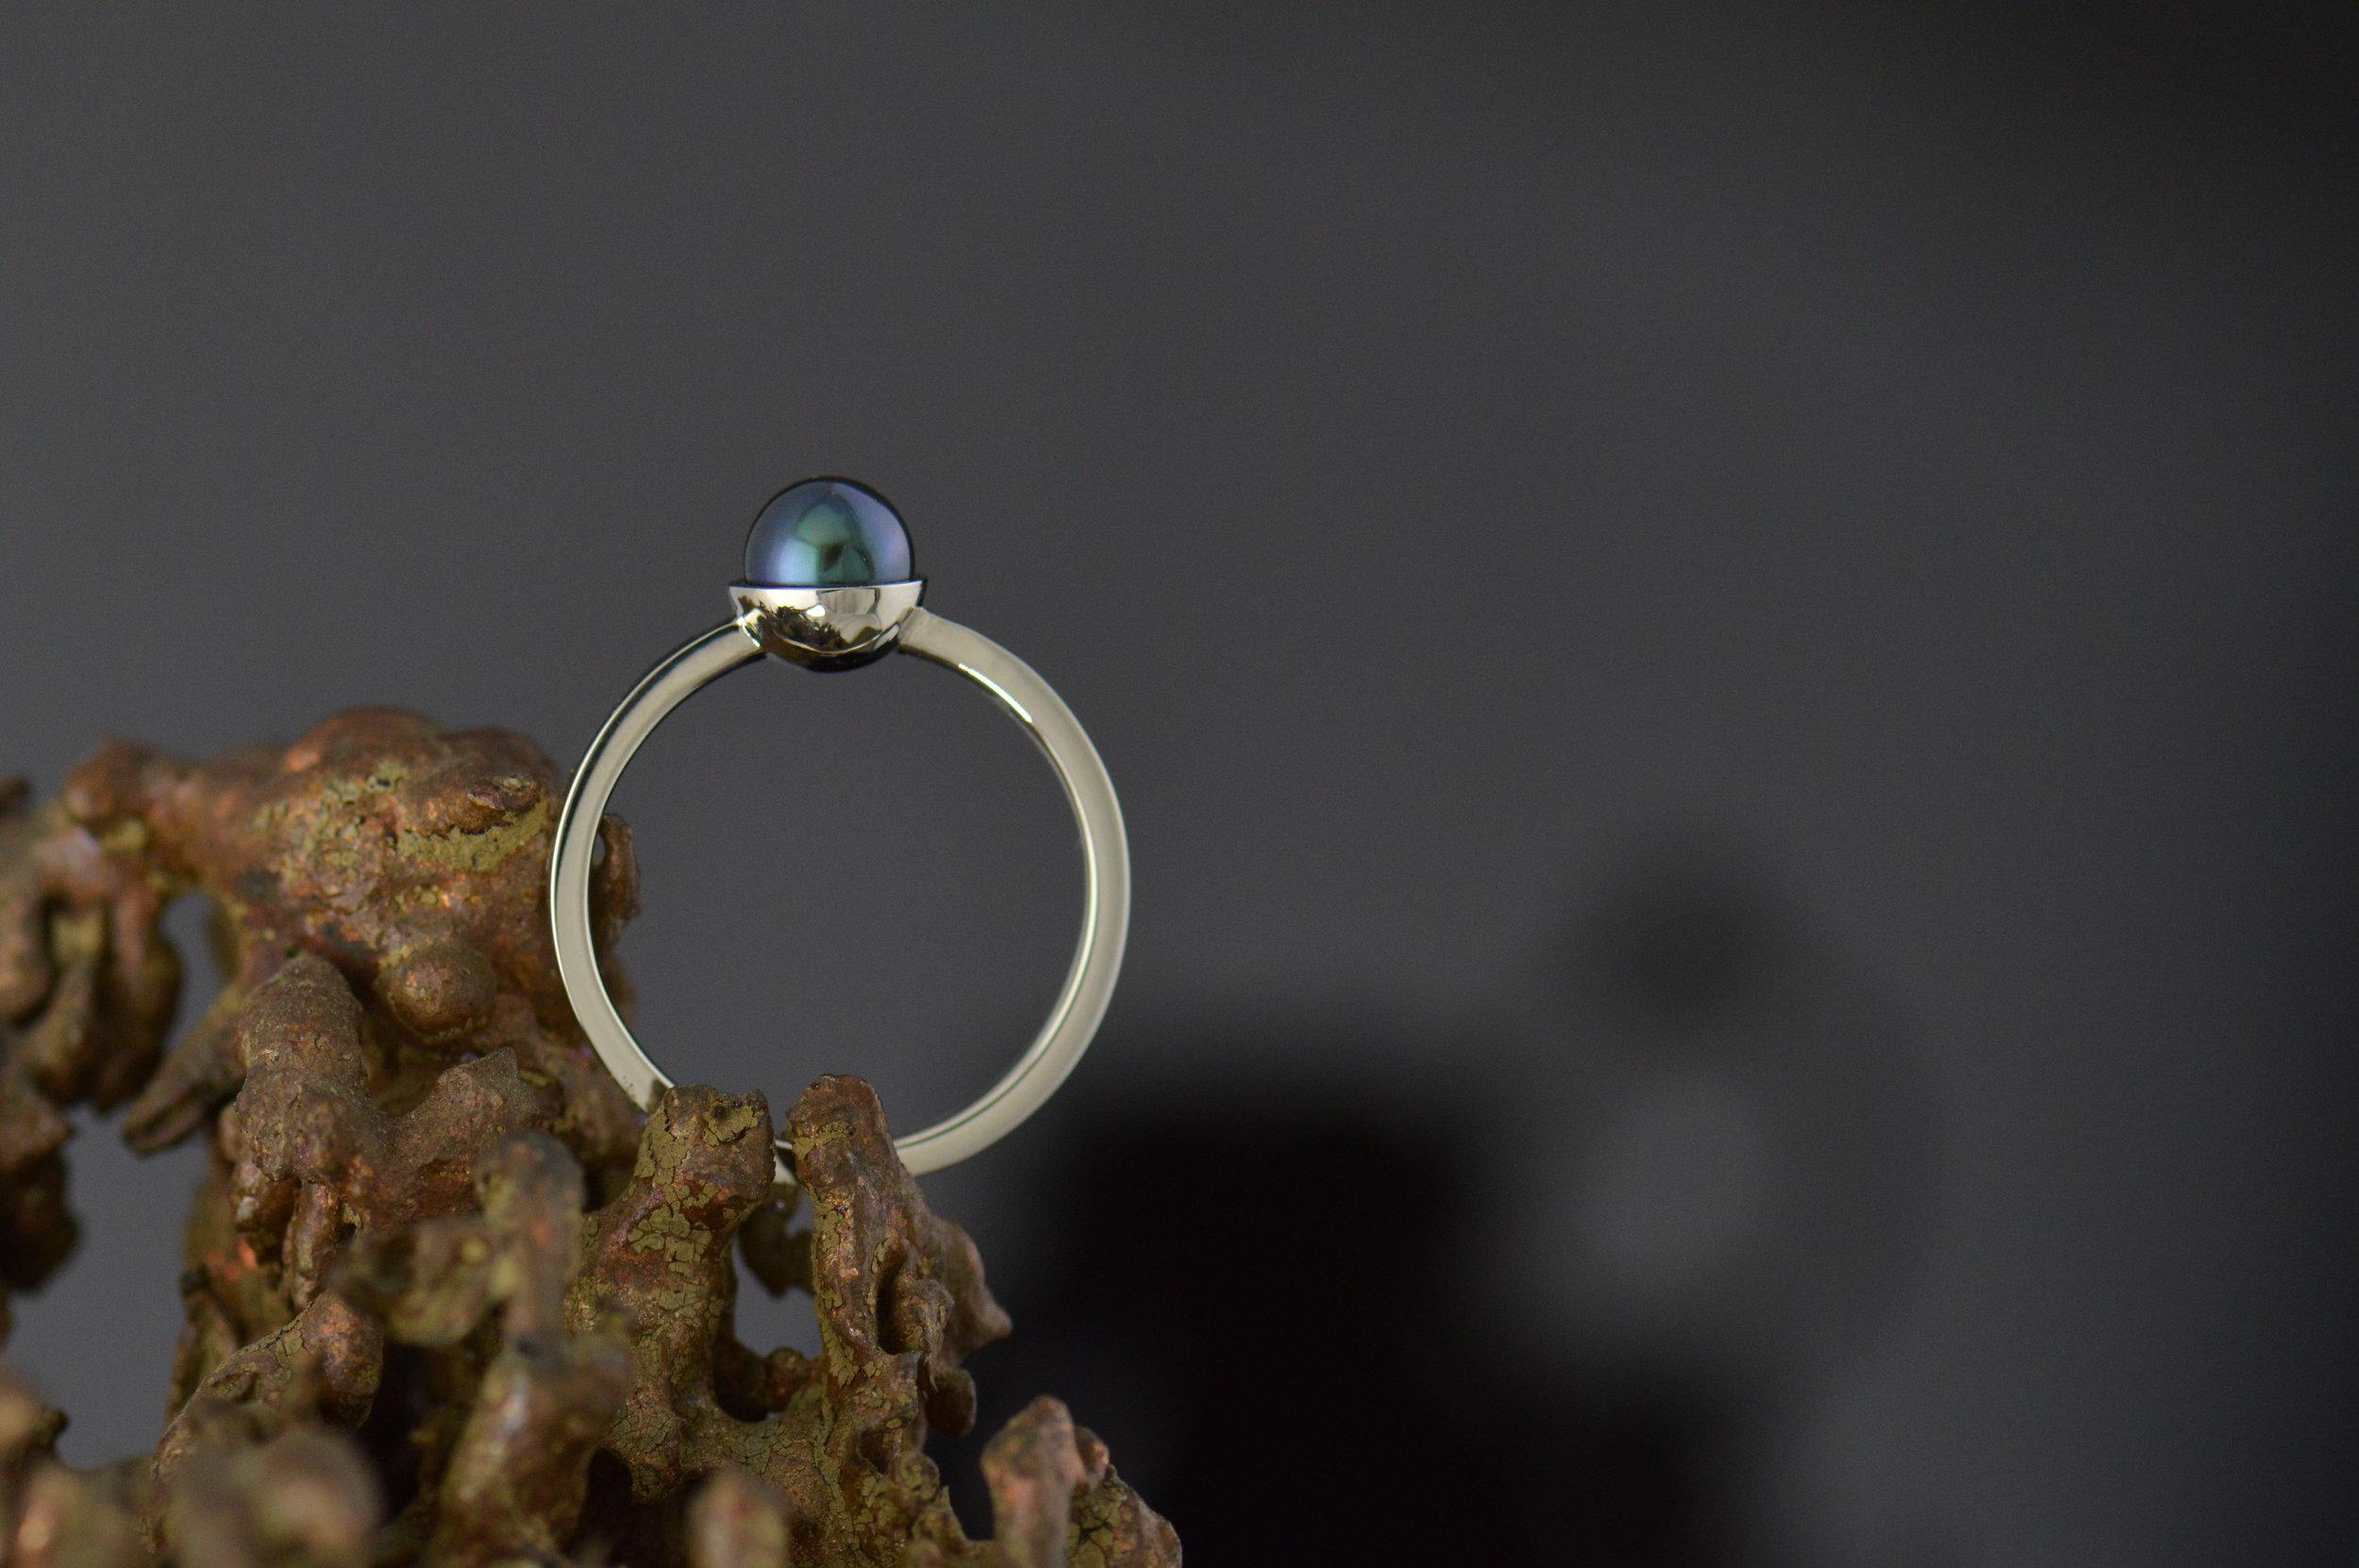 darvier-leroy-jenkins-tahitian-pearl-green-gold-ring.JPG